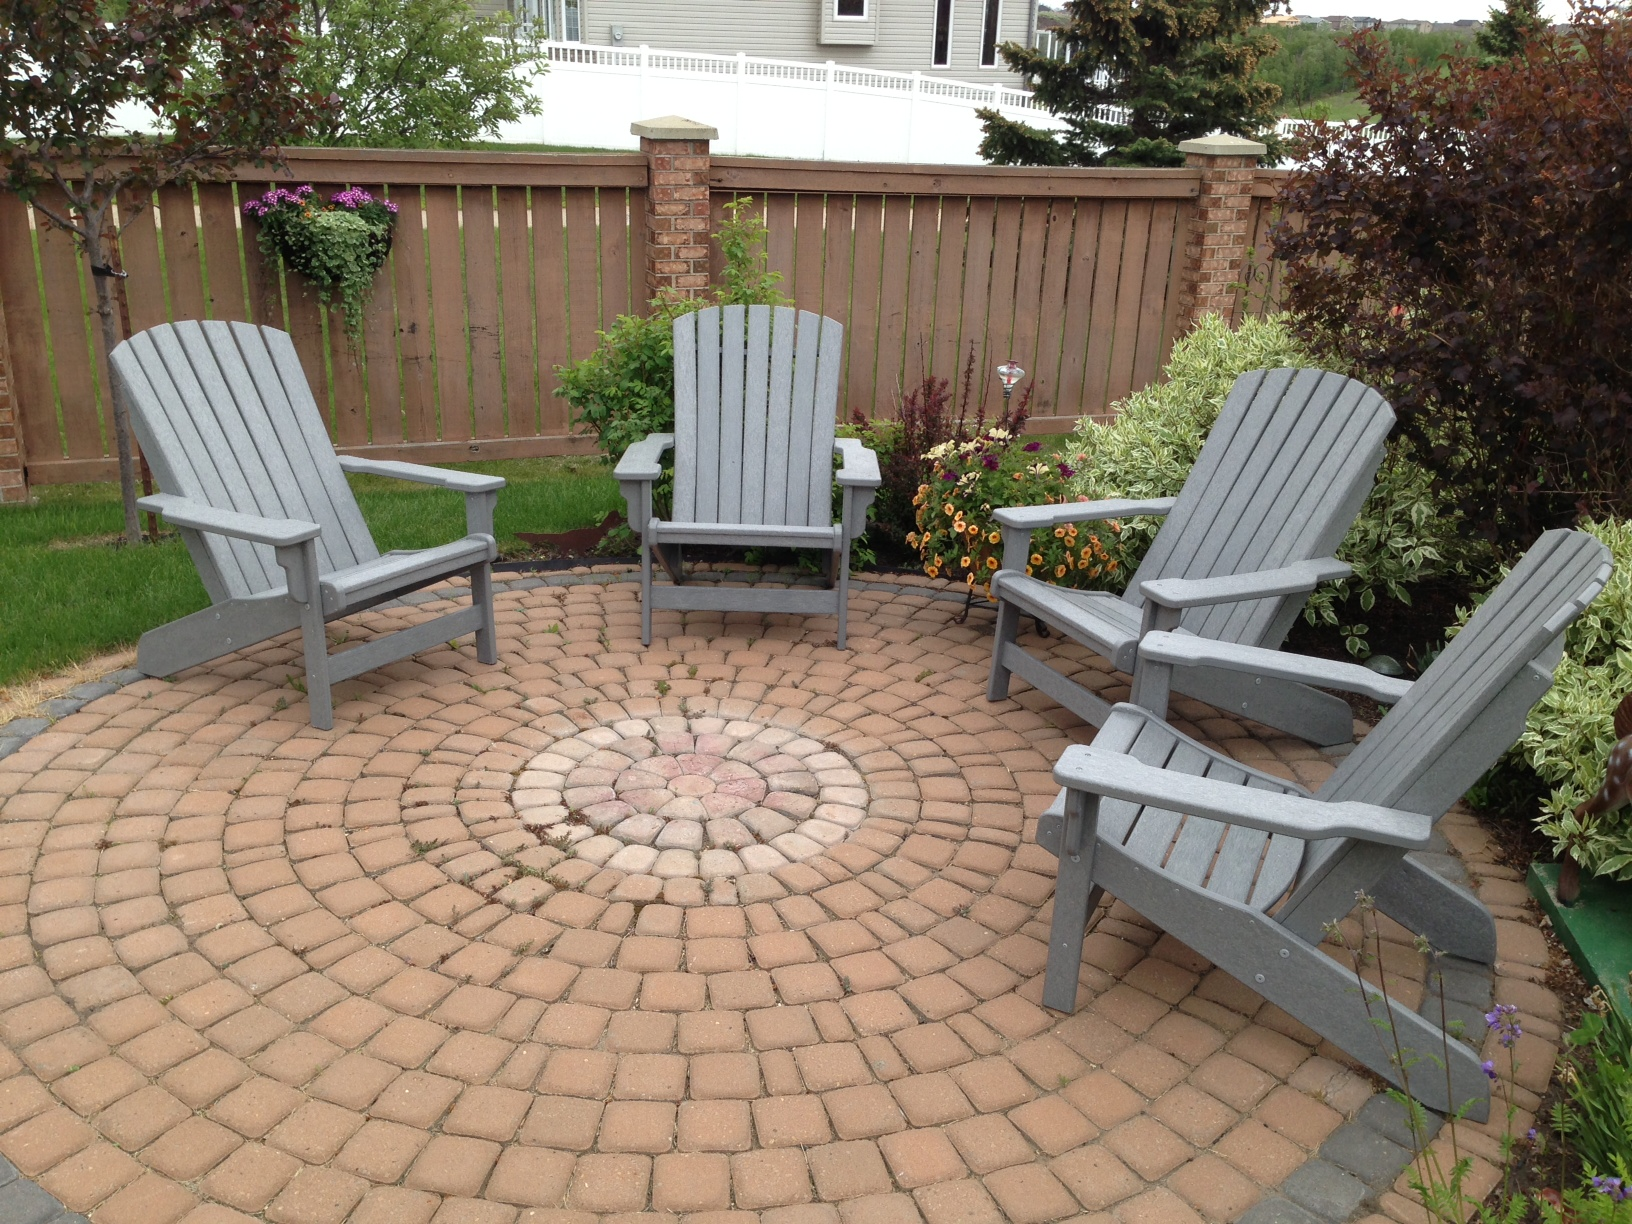 residential-patio-furniture (1).JPG